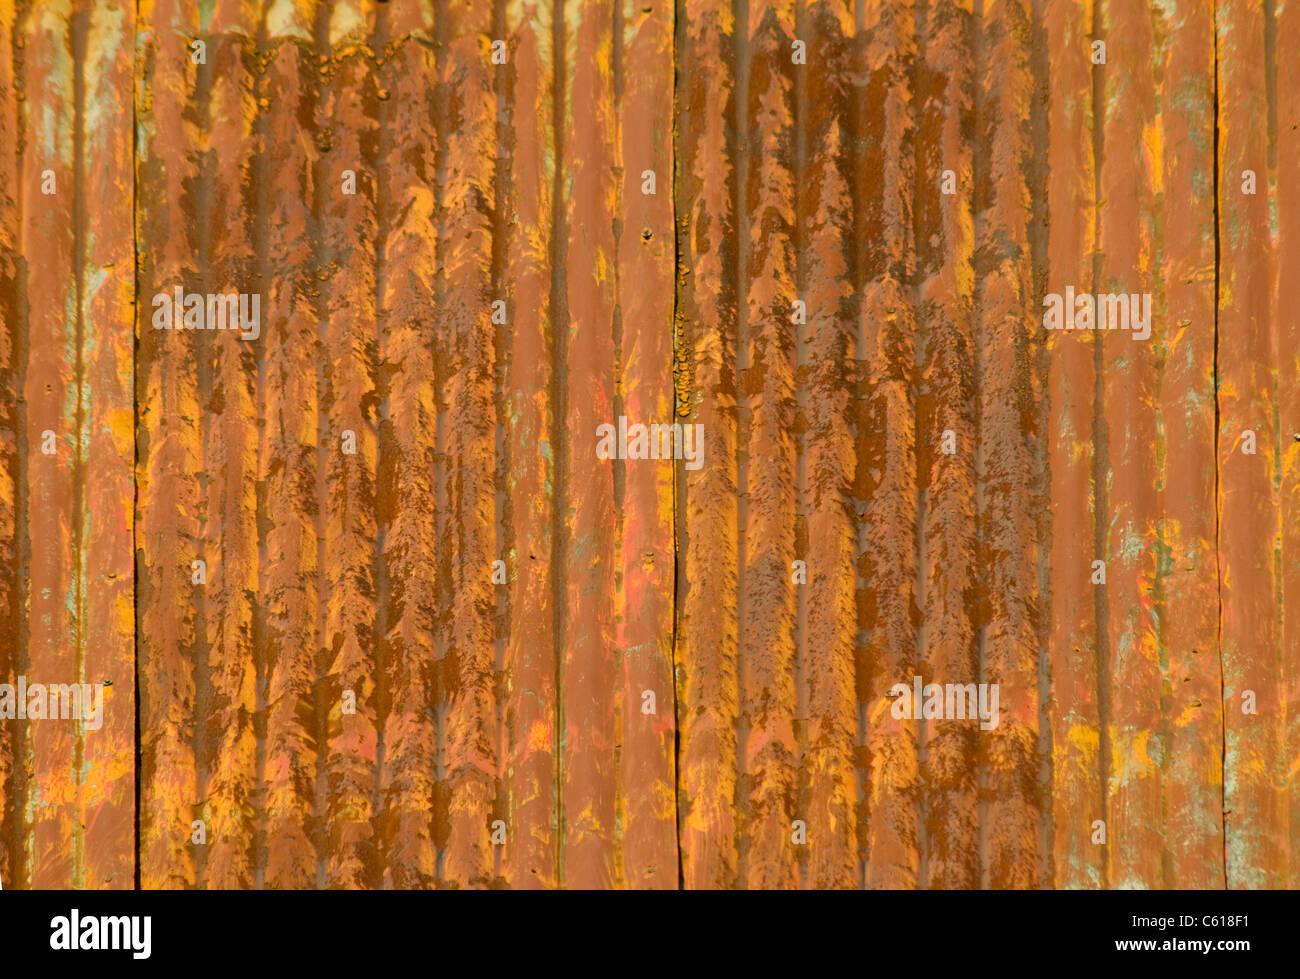 Rusty Corrugated Metal Roof Panel